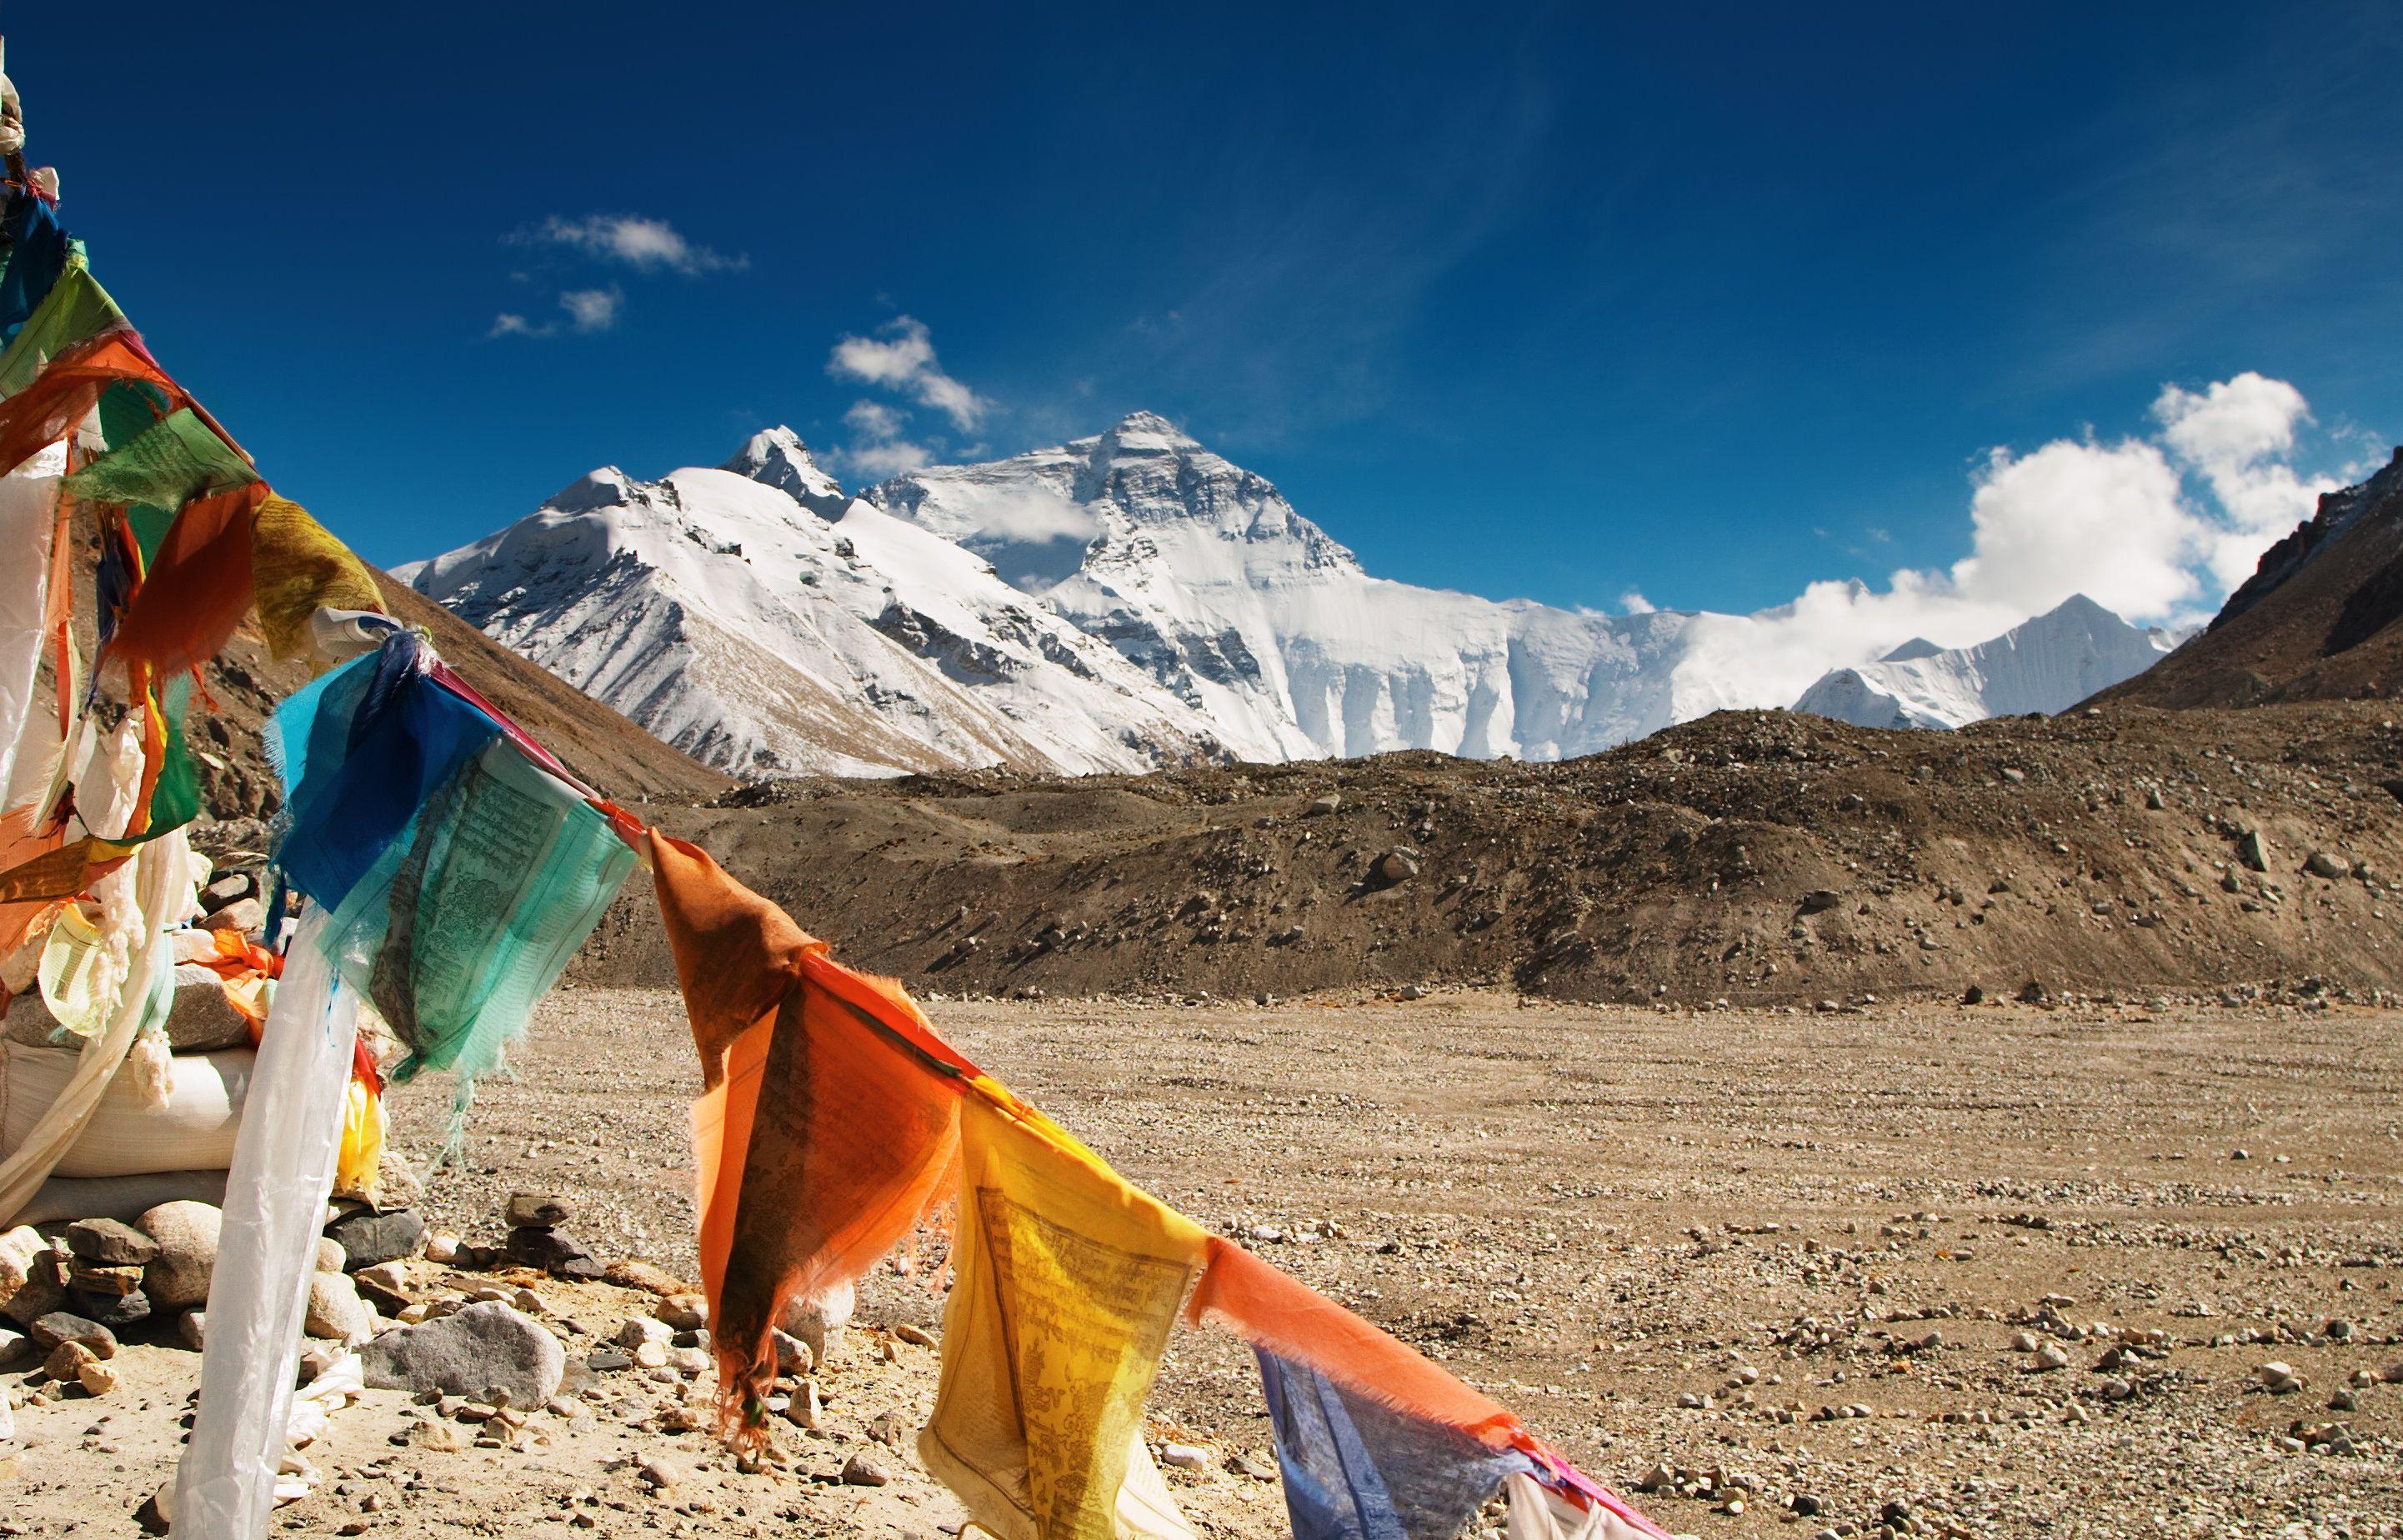 Photo Credit http://www.portersprogressuk.org/earthquake-in-nepal/